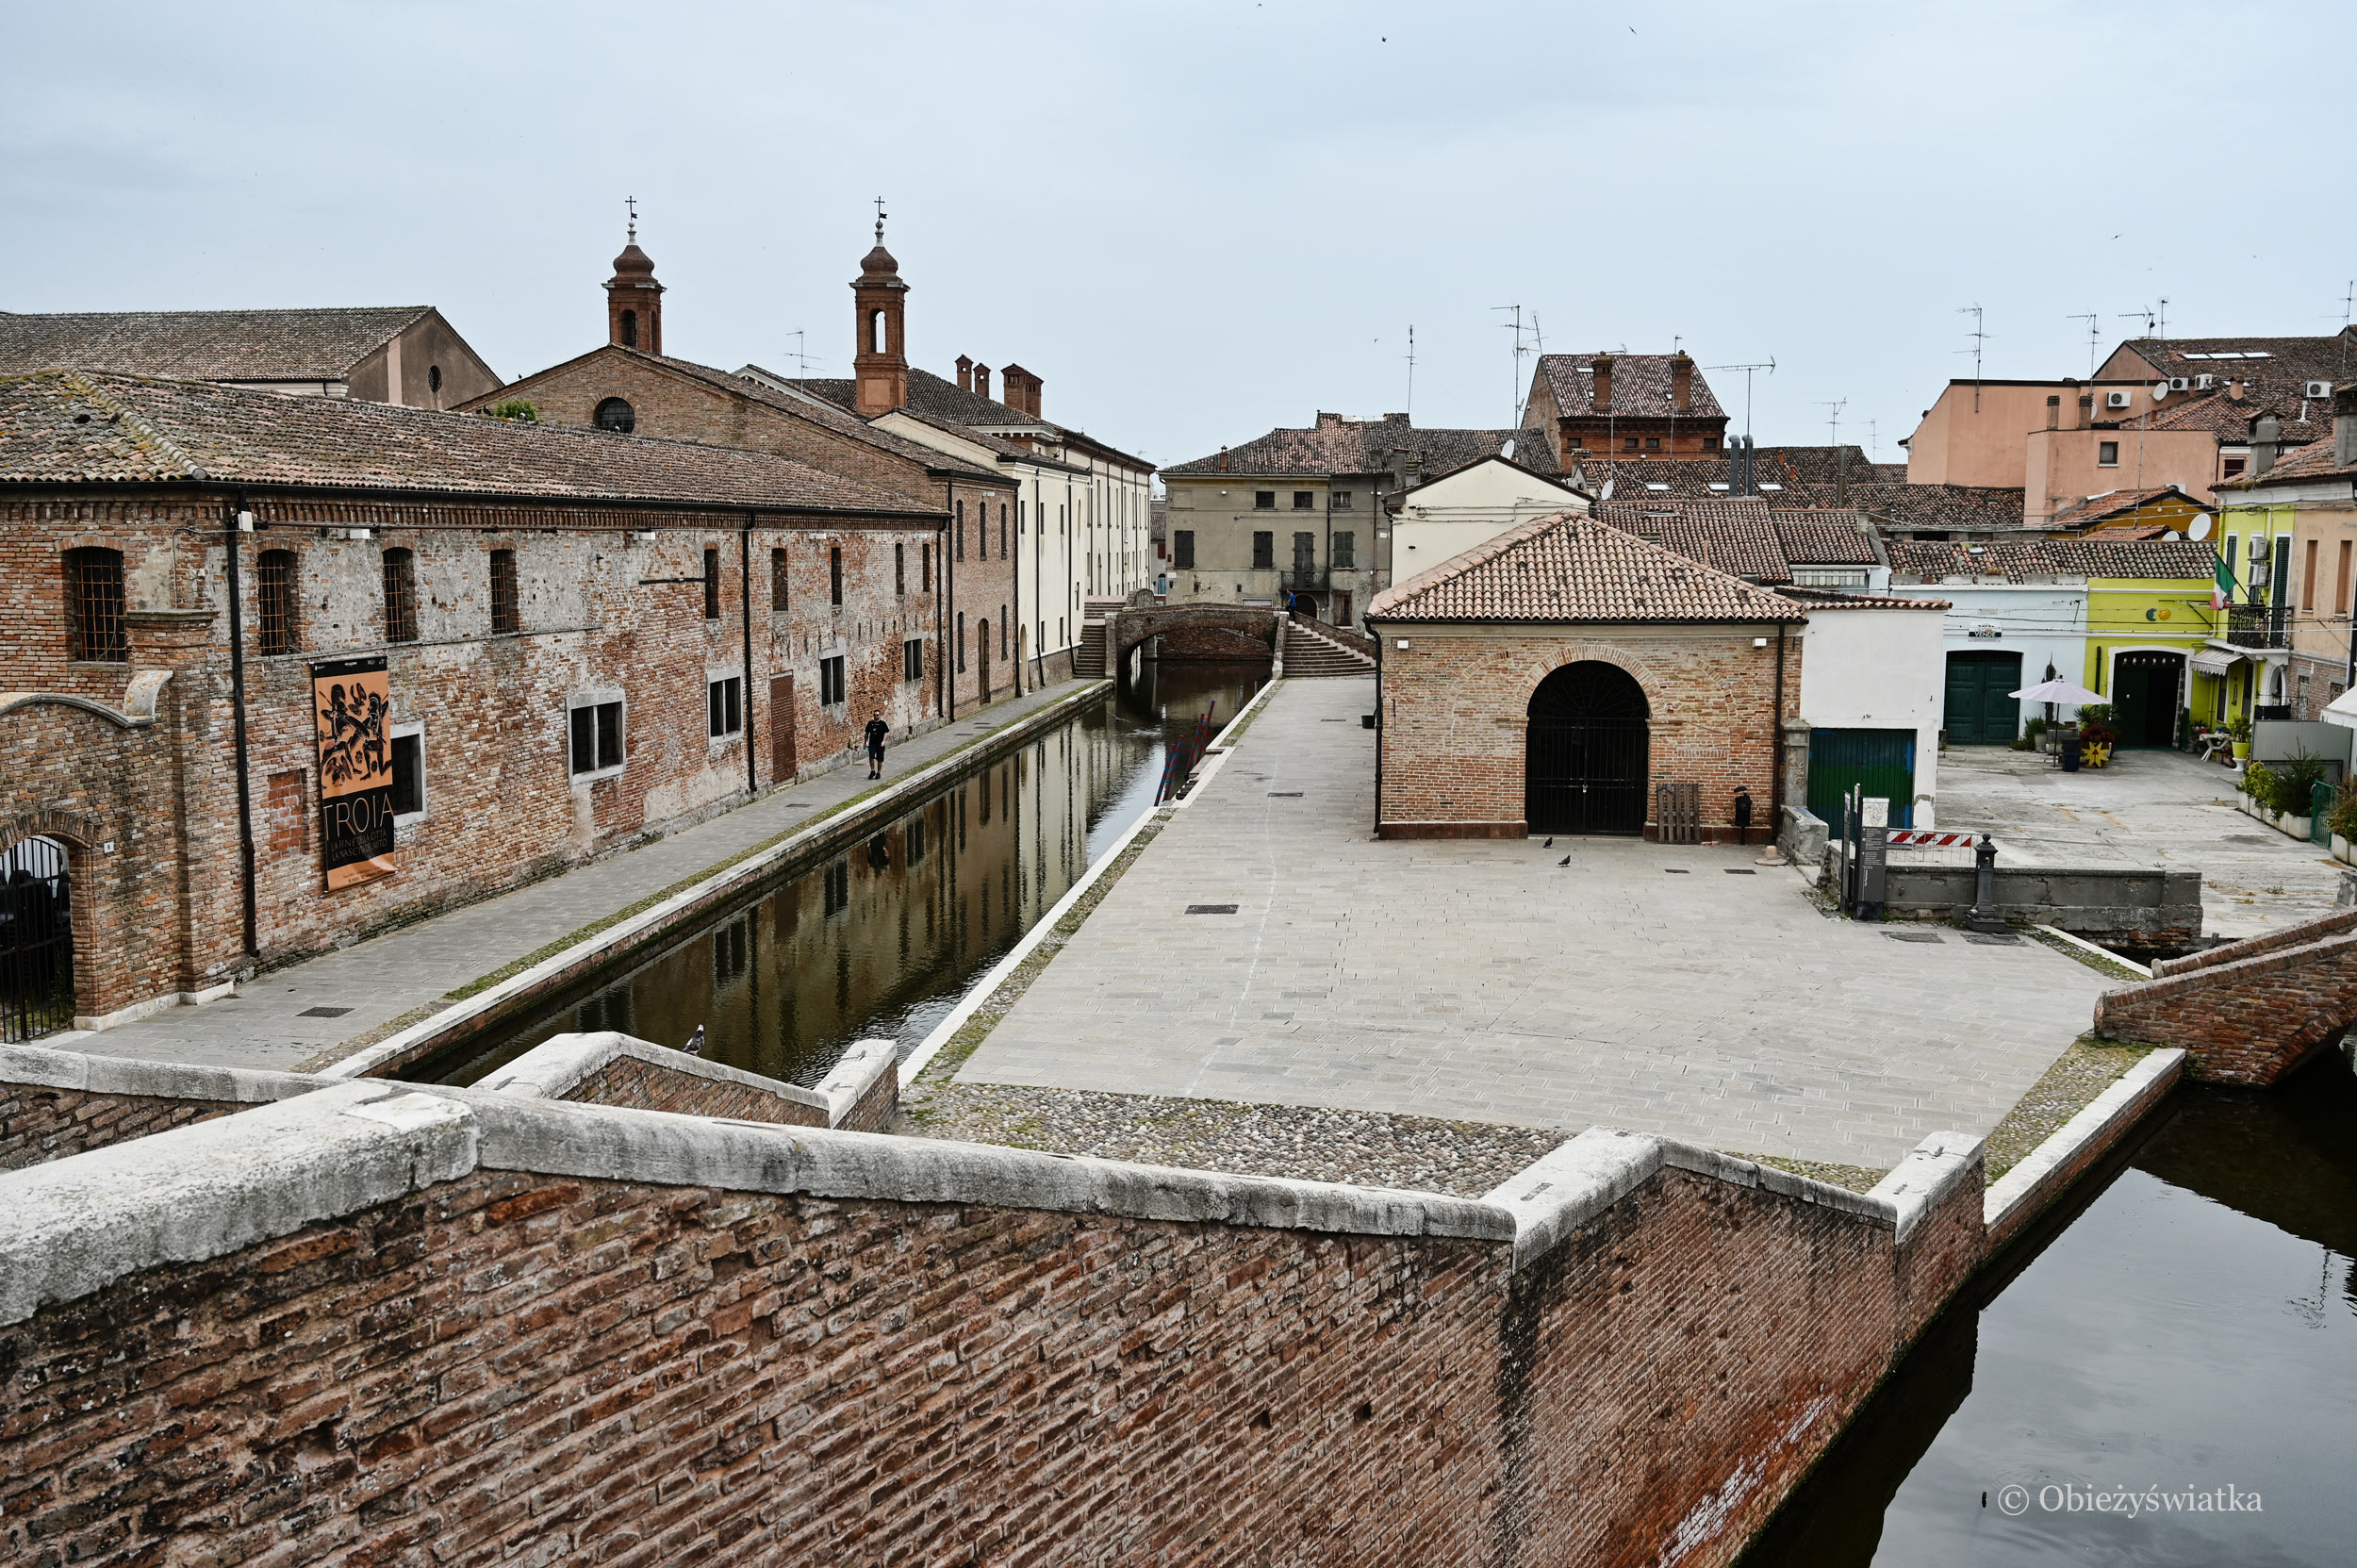 Comacchcio - widok na miasto z mostu Trepponti